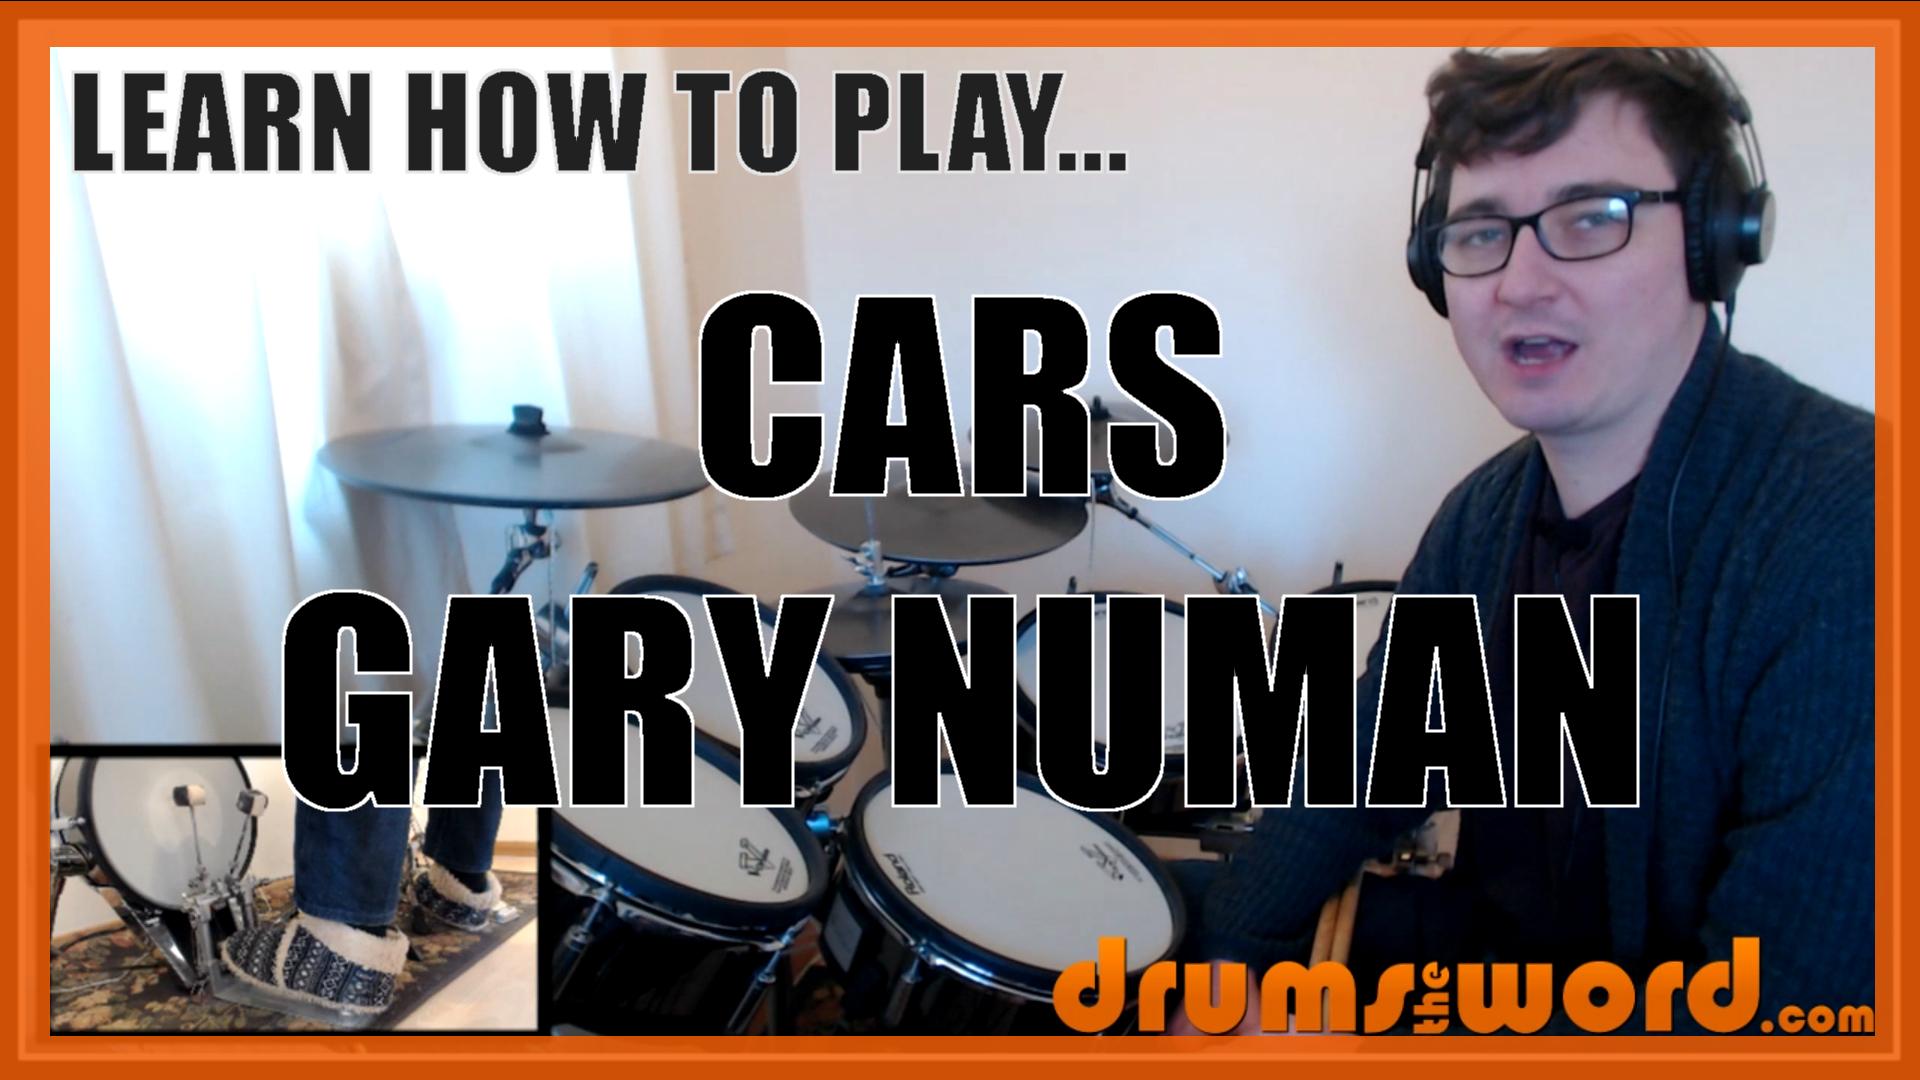 Cars Gary Numan Cedric Sharpley Drumstheword Online Video